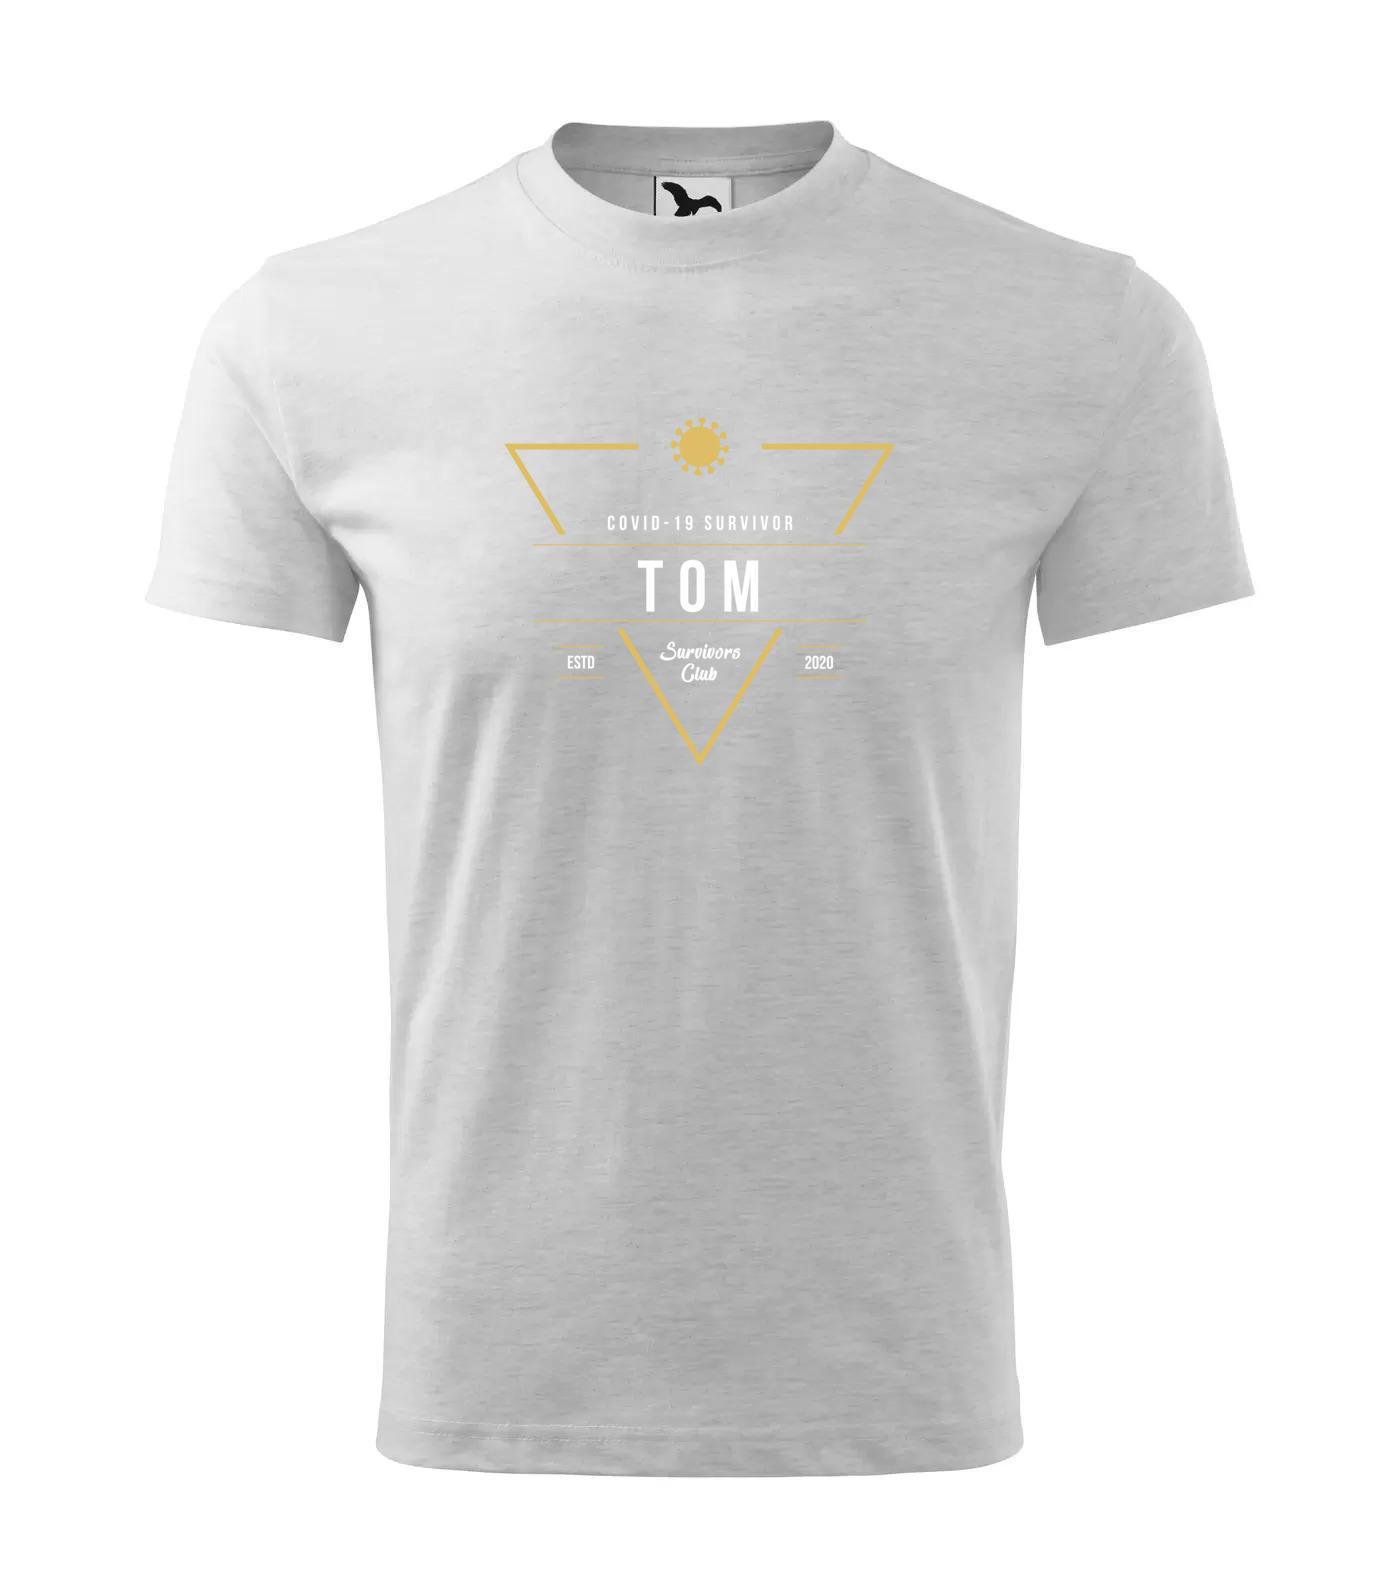 Tričko Survivor Club Tom